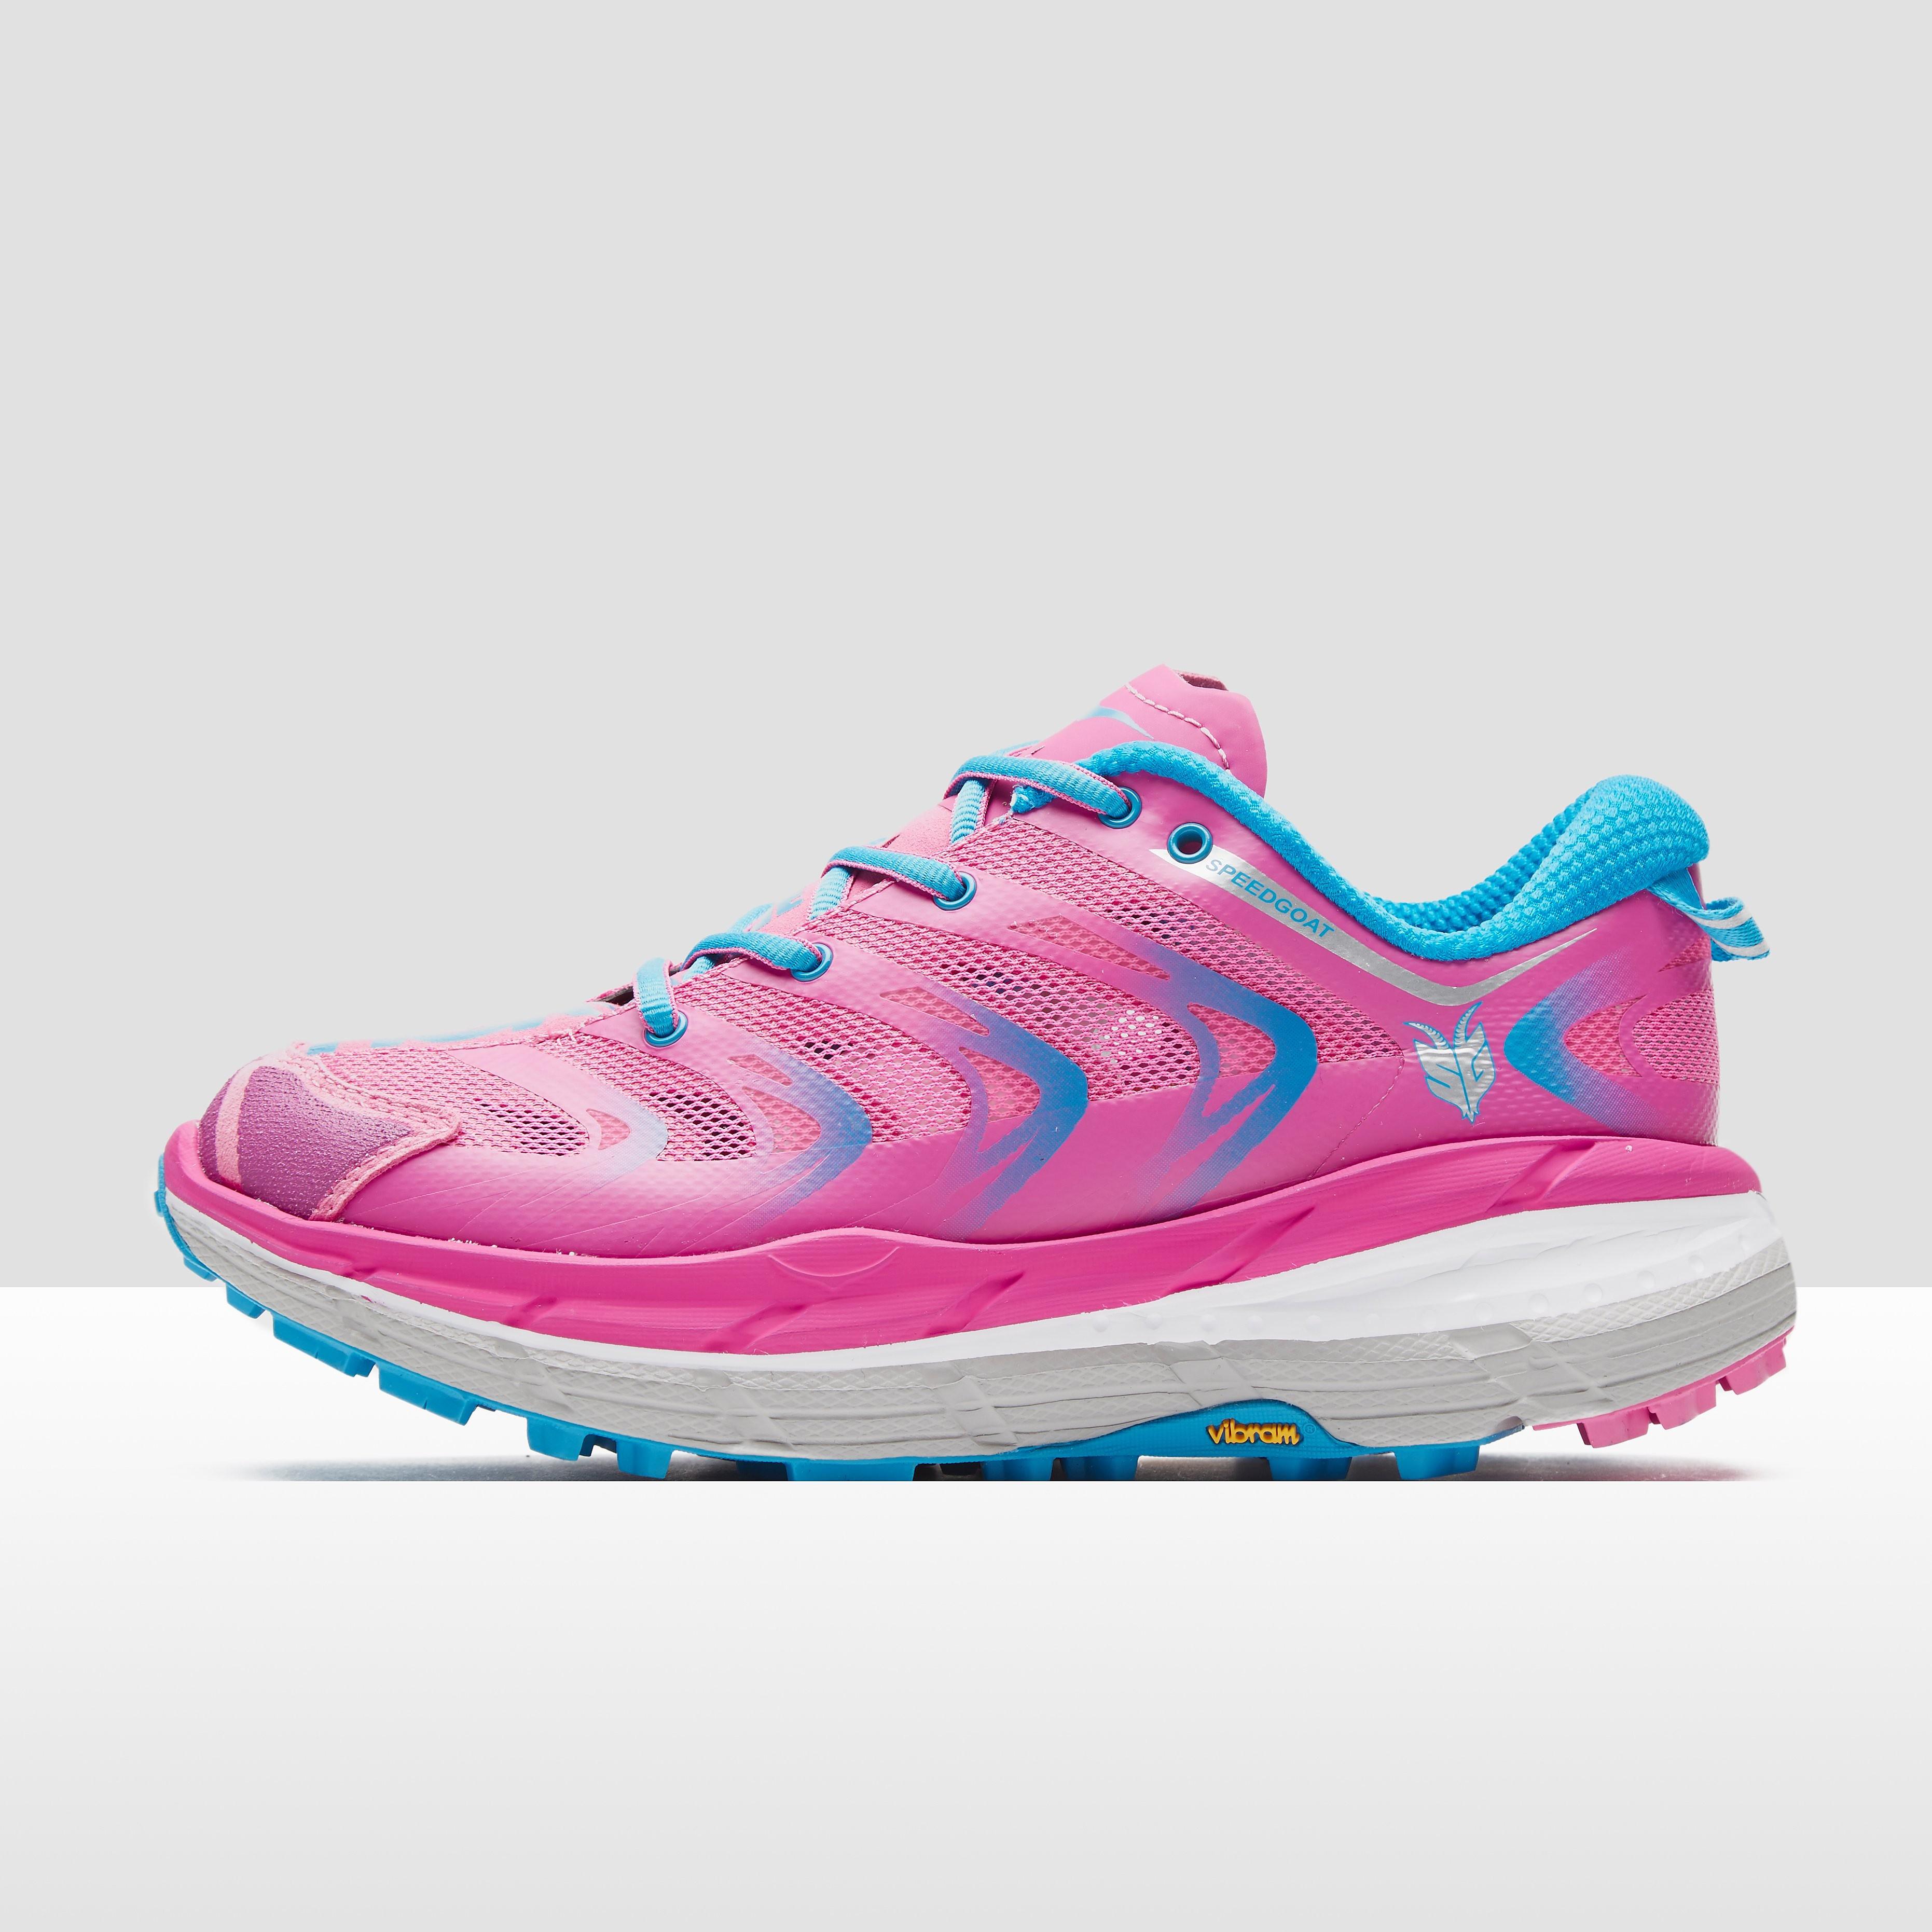 Hoka one one Speedgoat Women's Trail Running Shoes